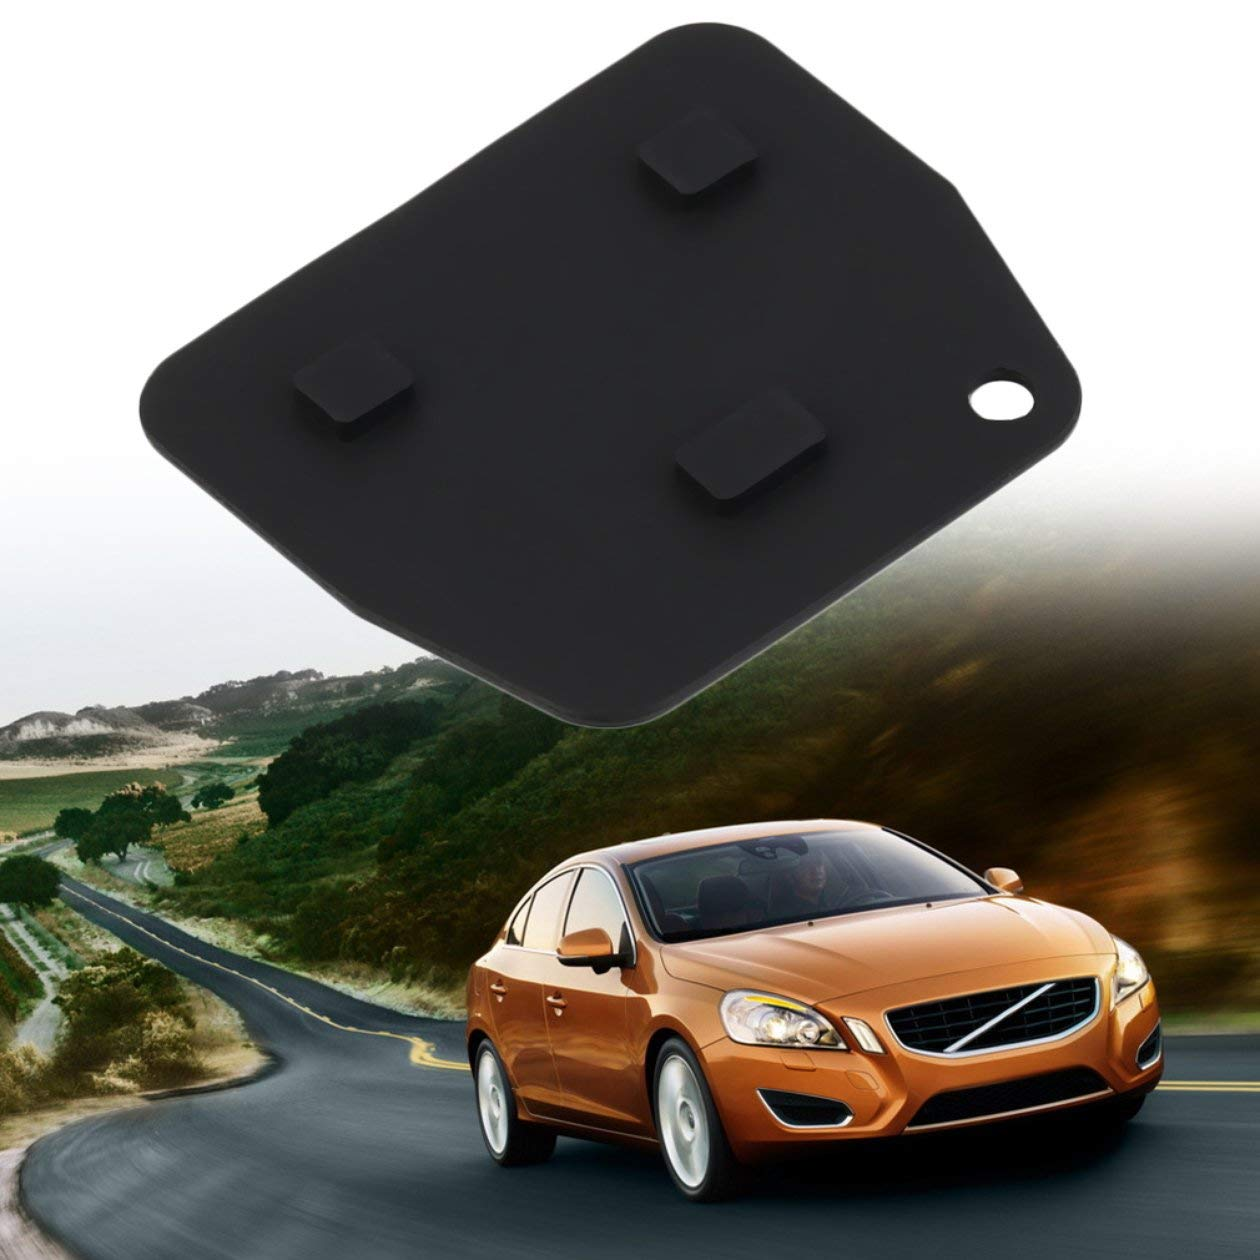 negro 1 unid Reemplazo de 3 botones de goma tecla remota almohadilla de empuje para Toyota Avensis Corolla para Lexus Rav4 3 bot/ón de llave remota